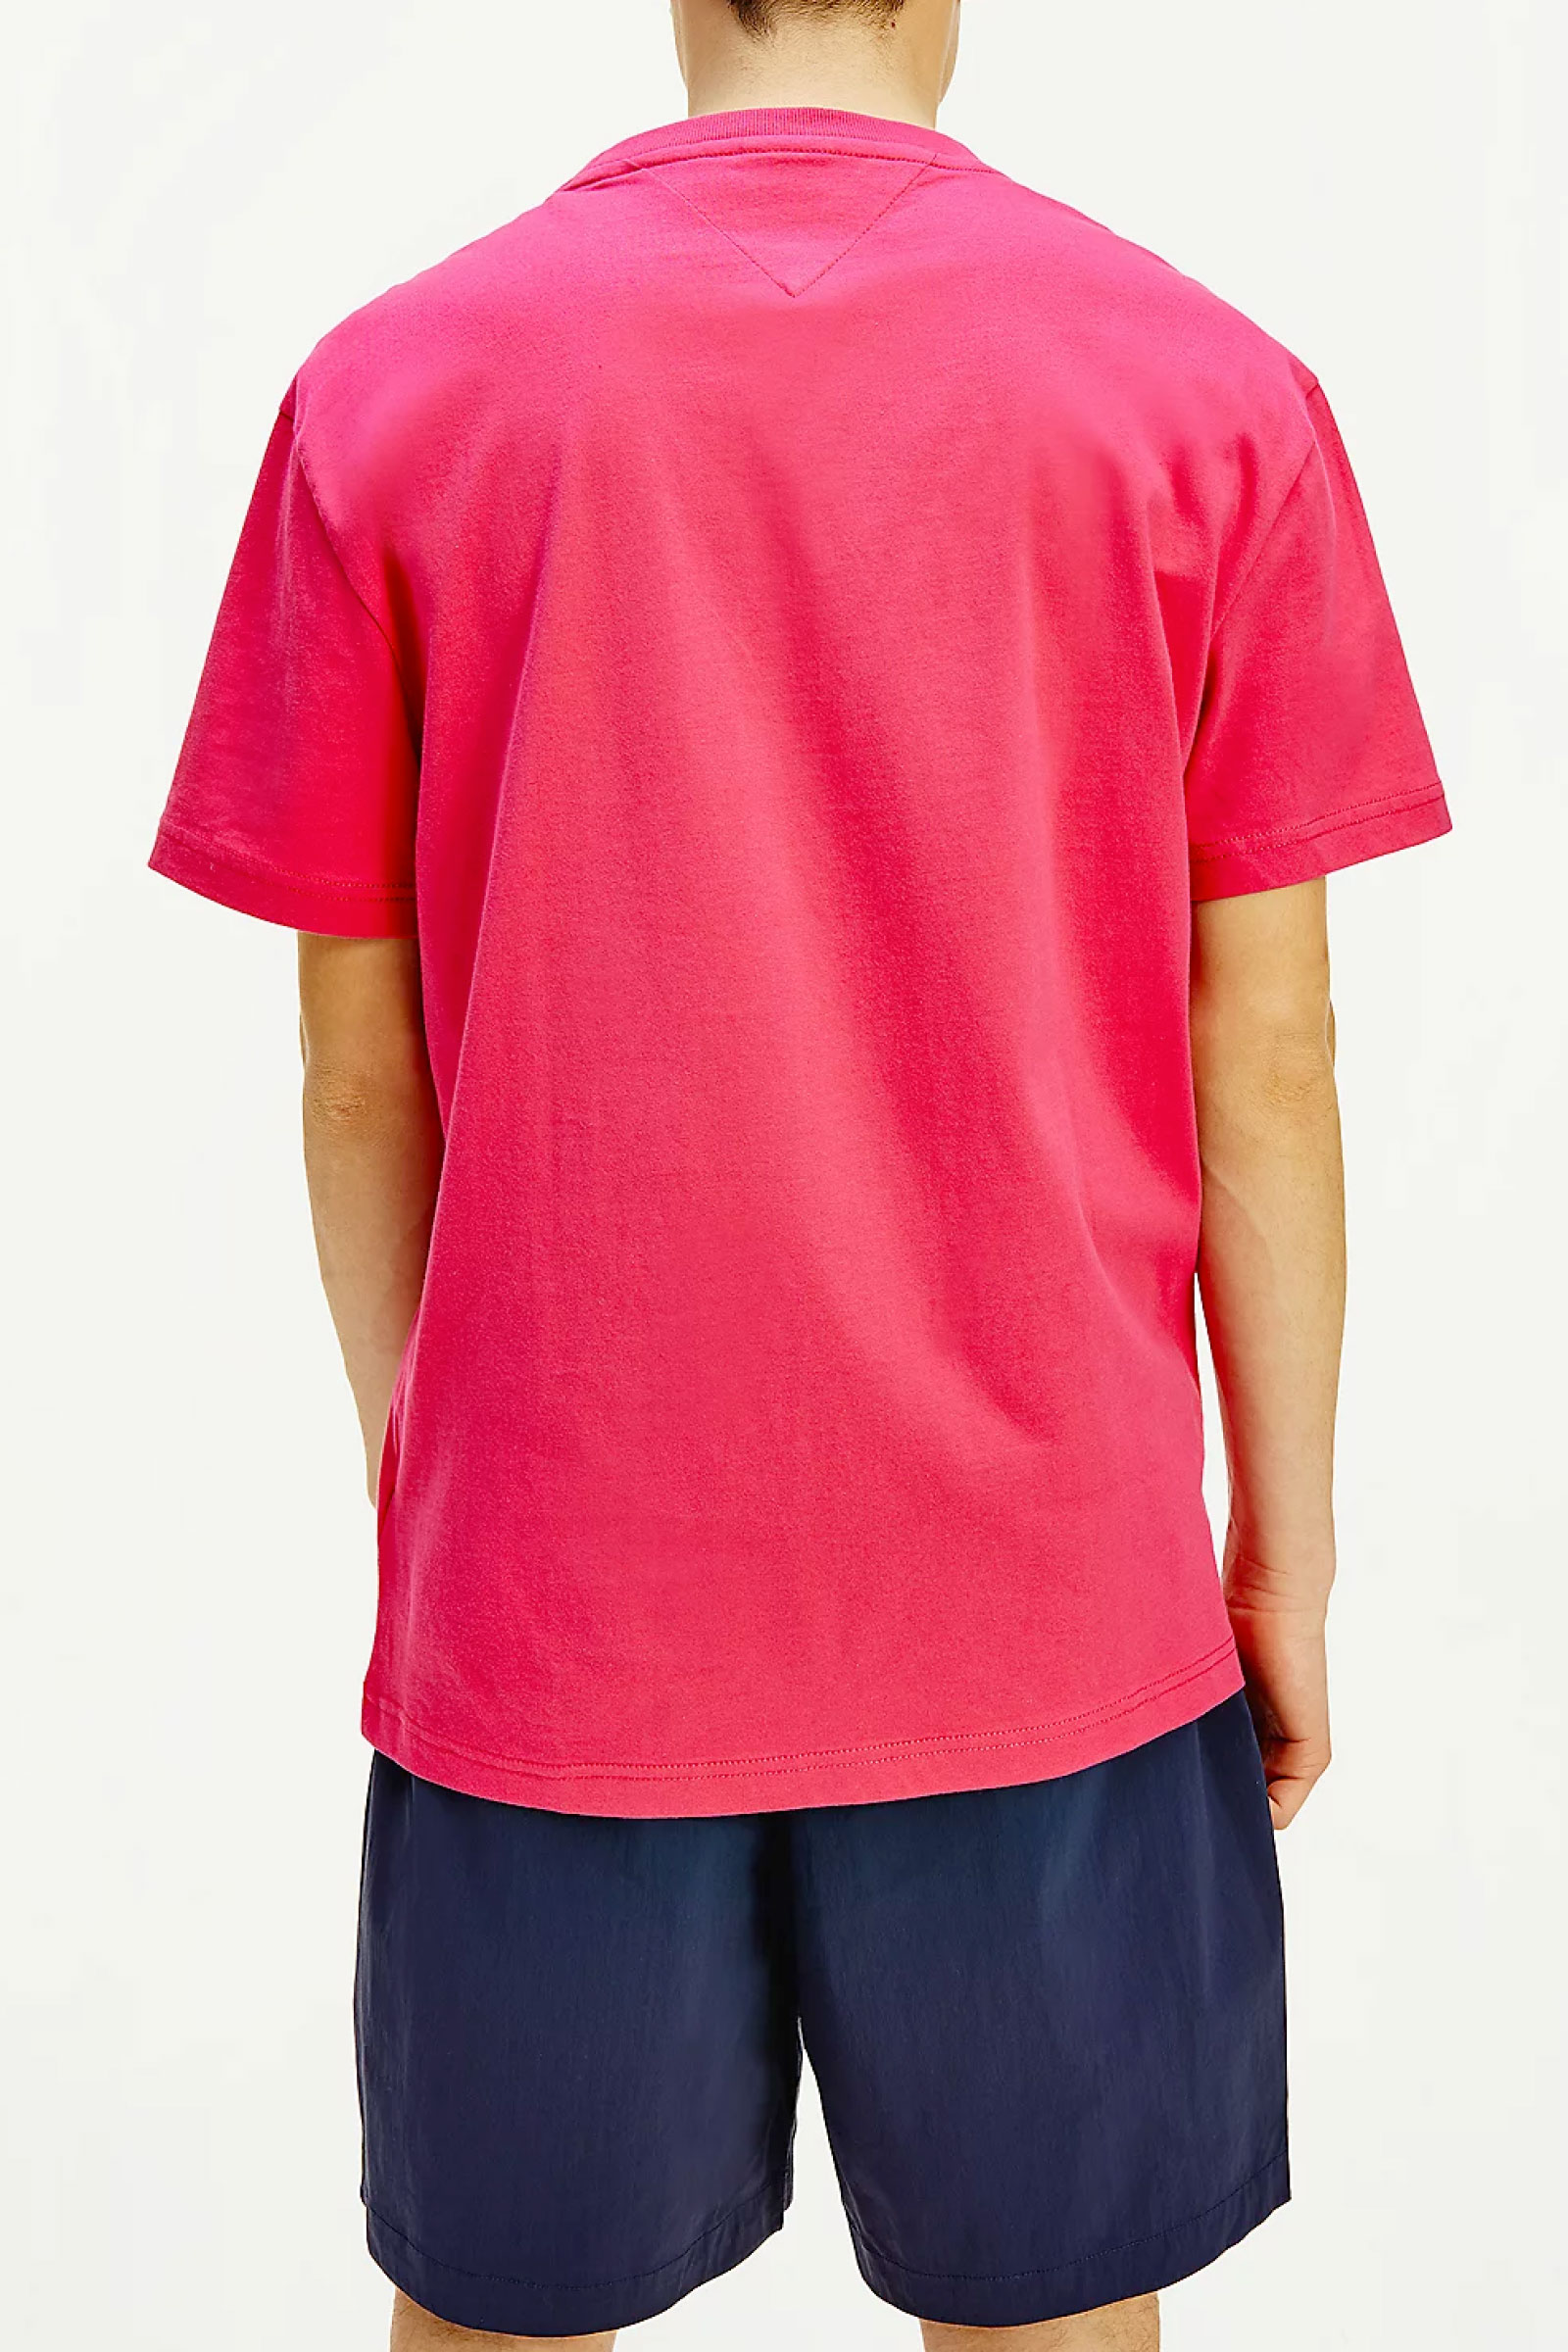 TOMMY JEANS Top Uomo TOMMY JEANS   T-Shirt   DM0DM10702T1K